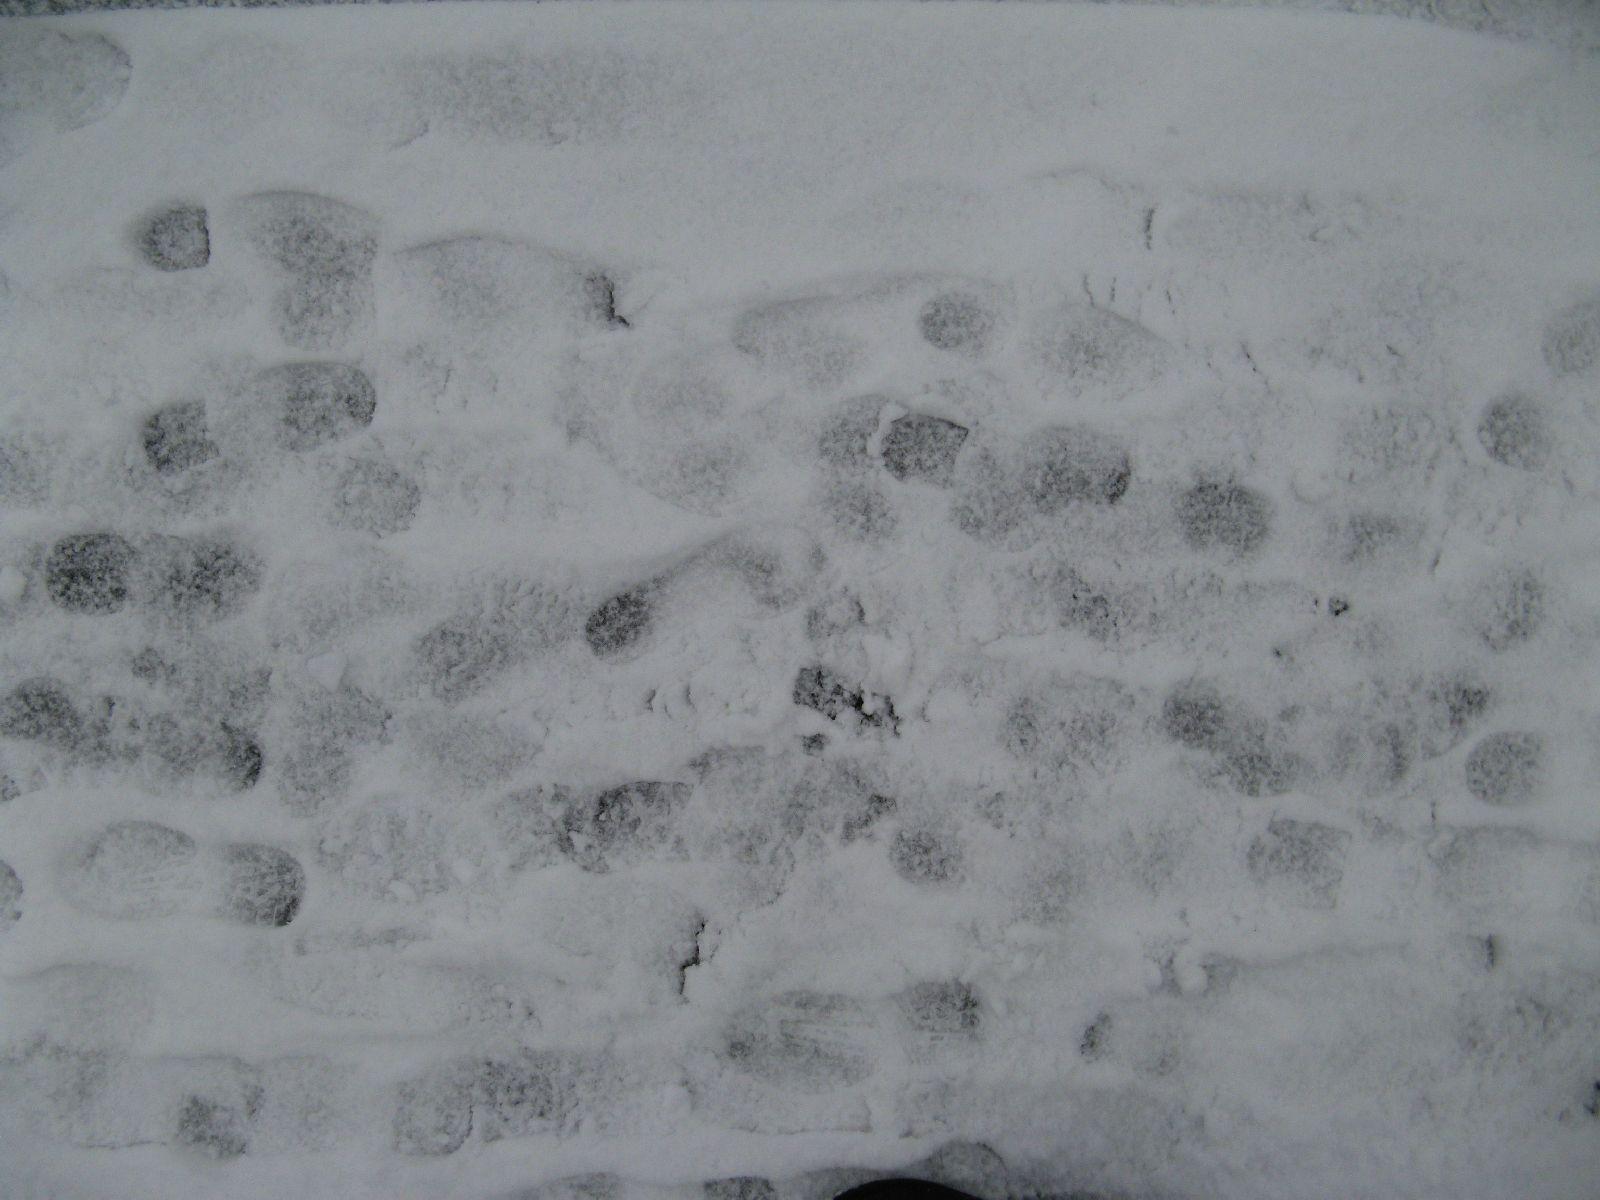 Schnee-Eis_Textur_B_5893